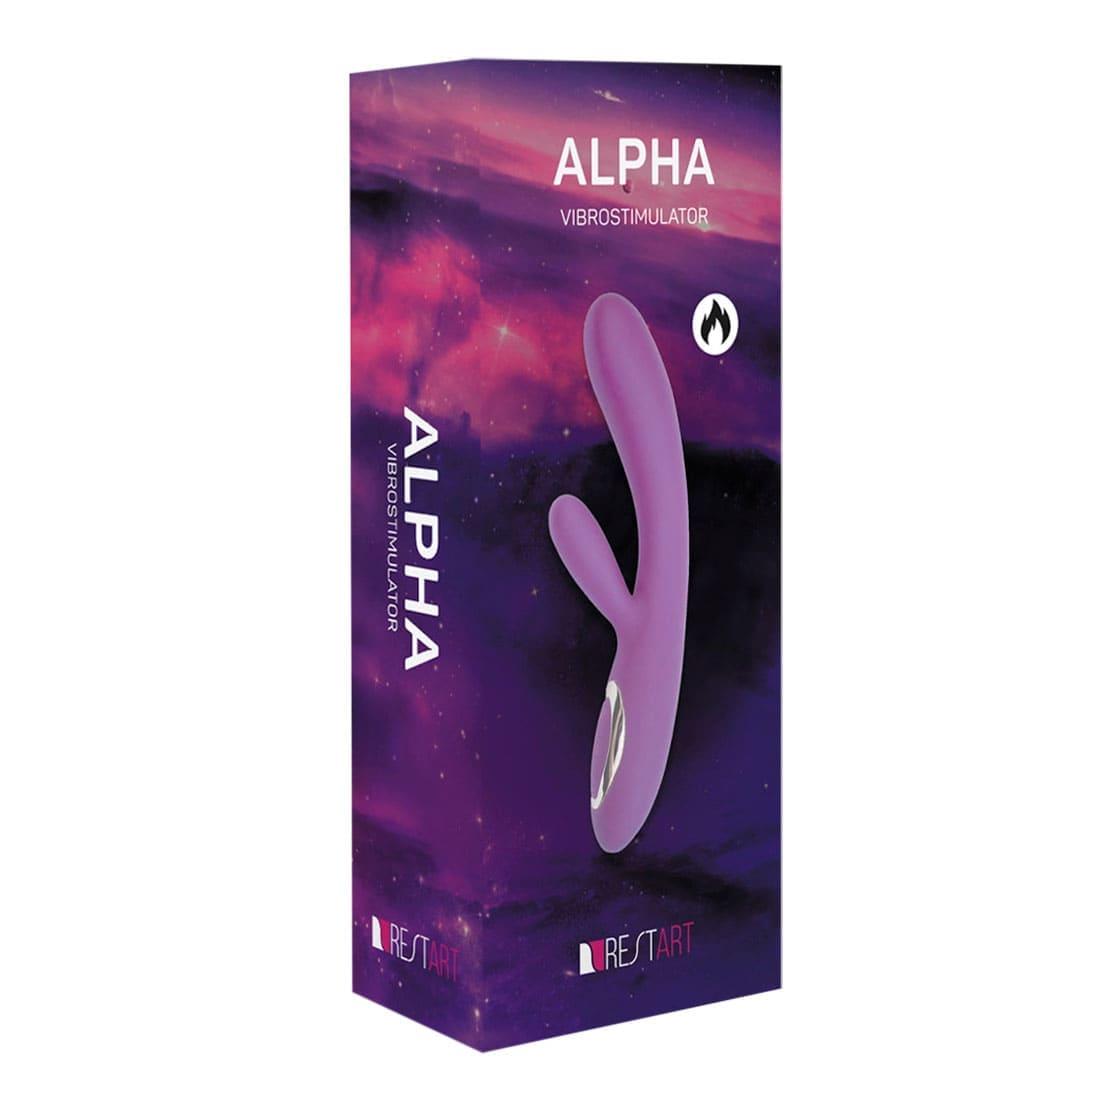 Alpha вибратор (вибростимулятор)